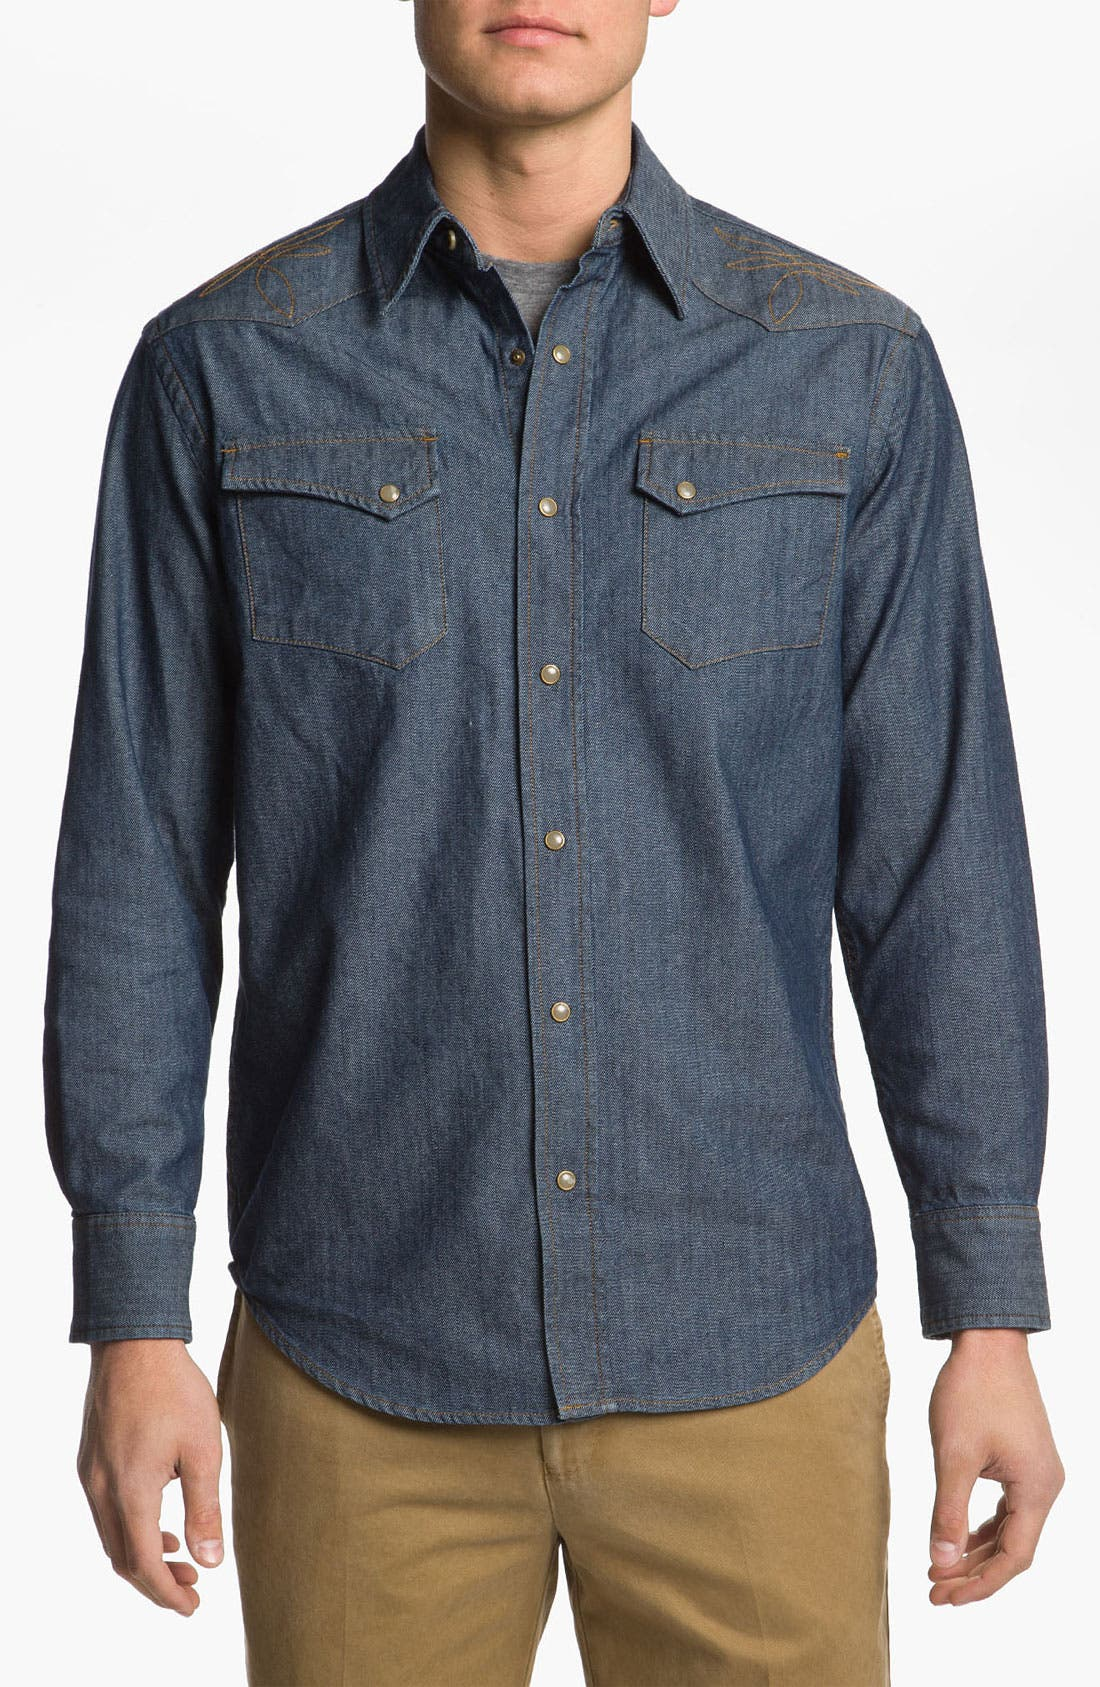 Alternate Image 1 Selected - Pendleton Fitted Denim Shirt